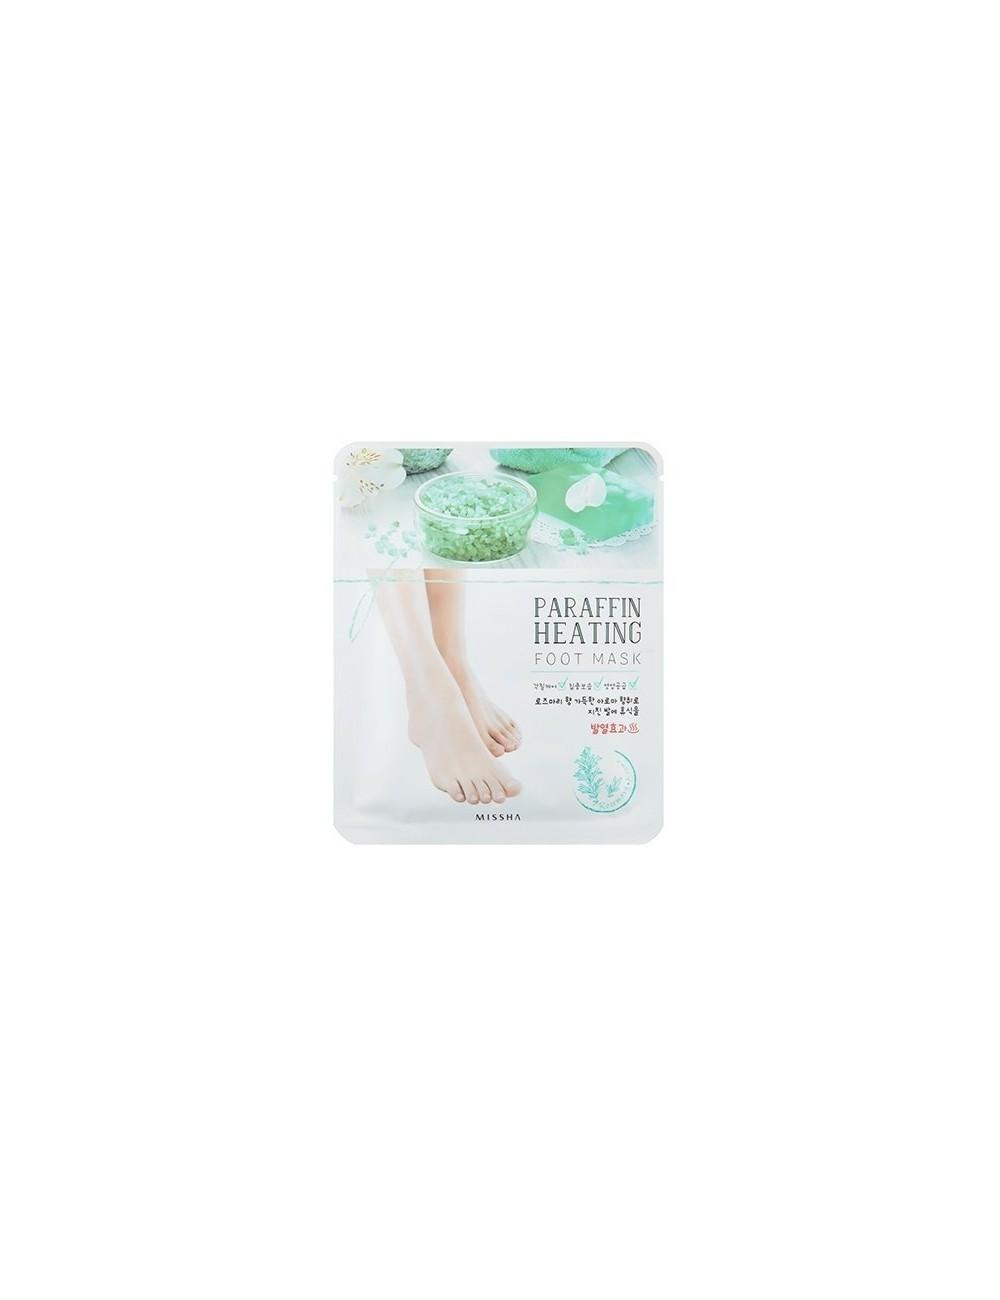 Mascarilla Hidratante de Parafina para Pies Missha Paraffin Heating Foot Mask